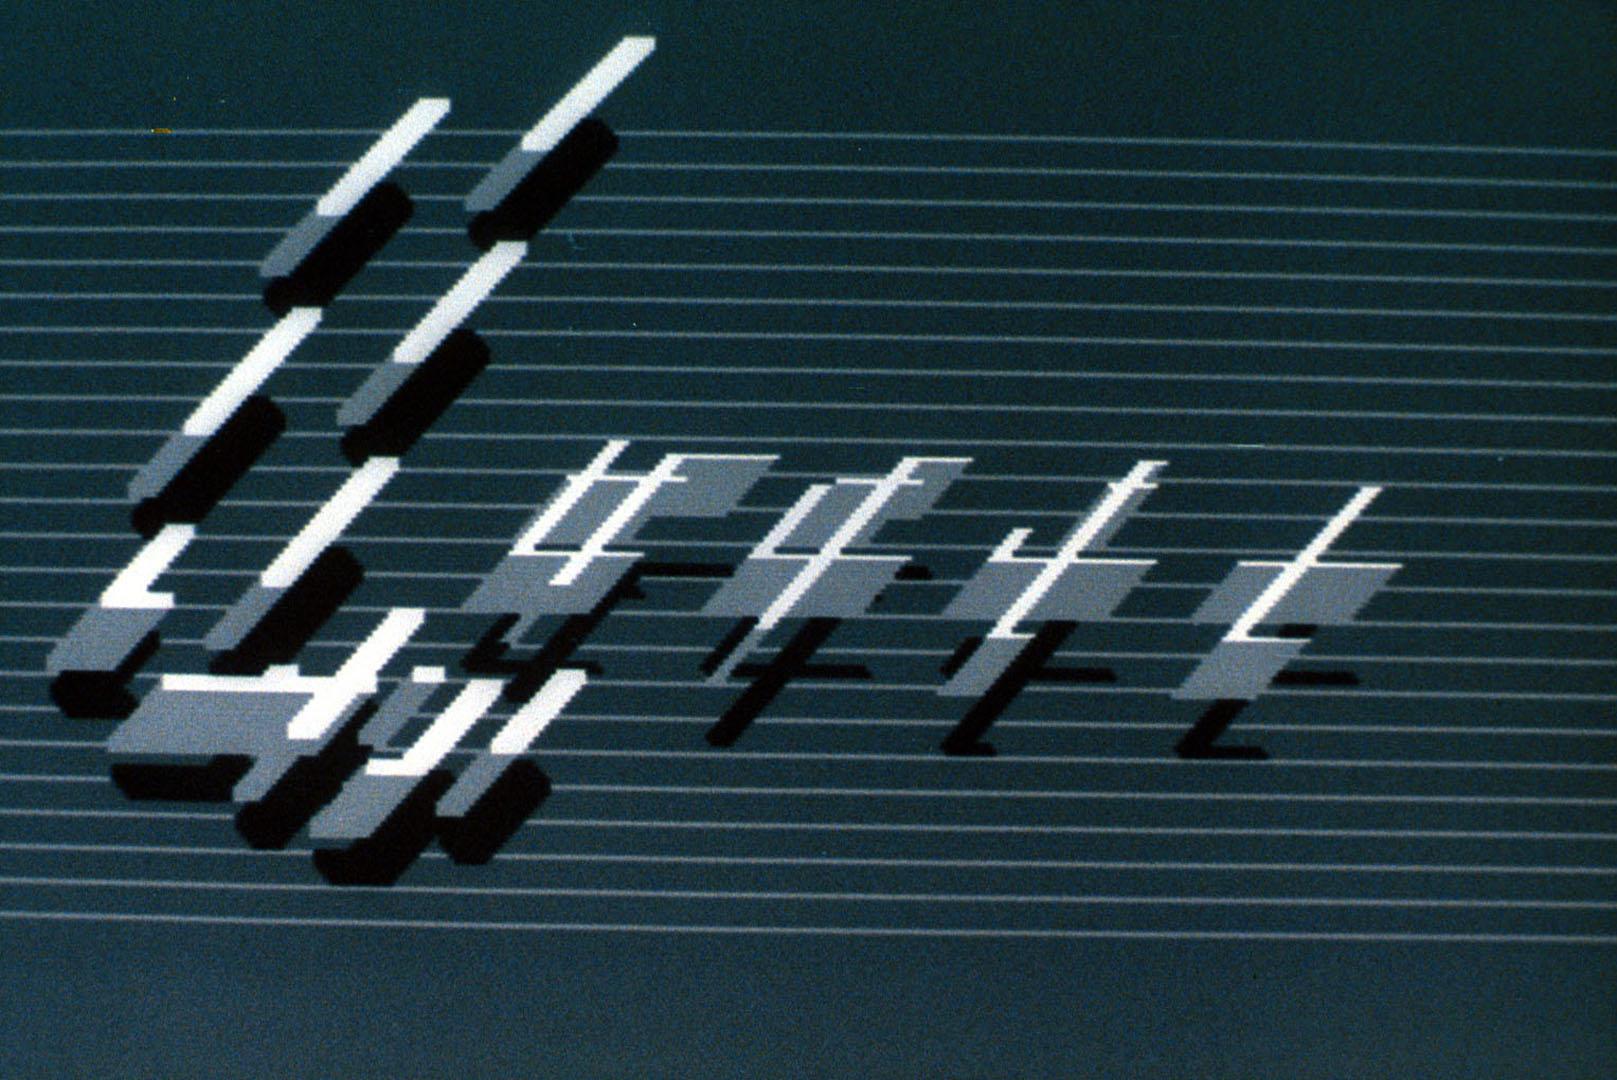 ©1985, Larry Cuba, Calculated Movements